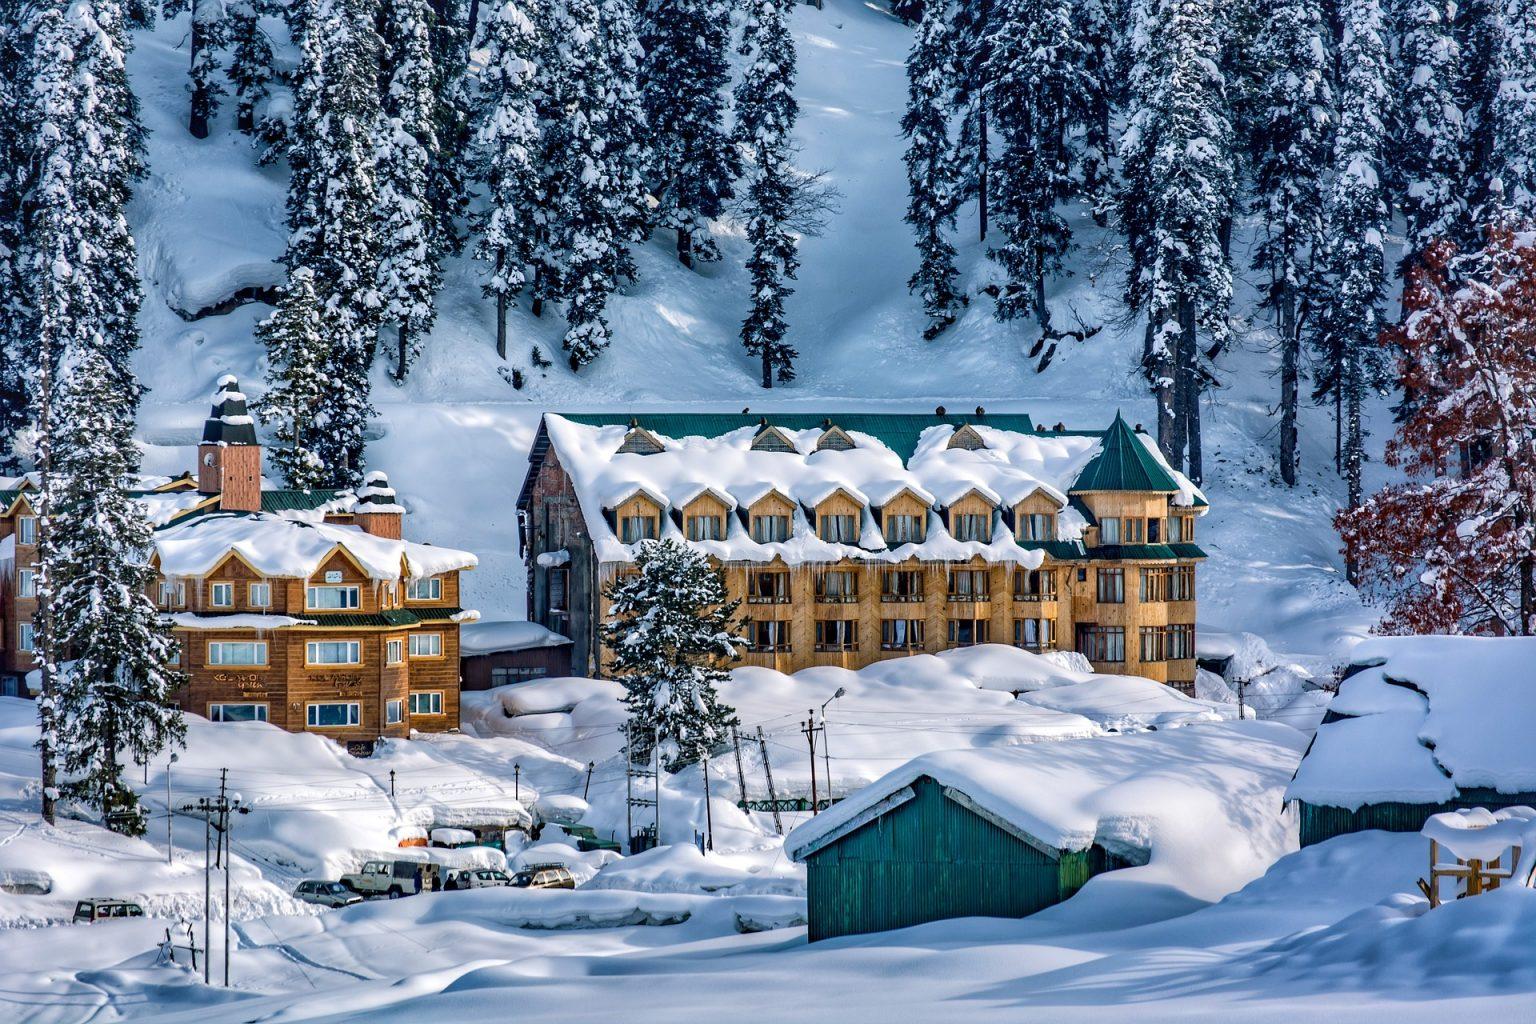 Destino Nieve Travel Granada Tour